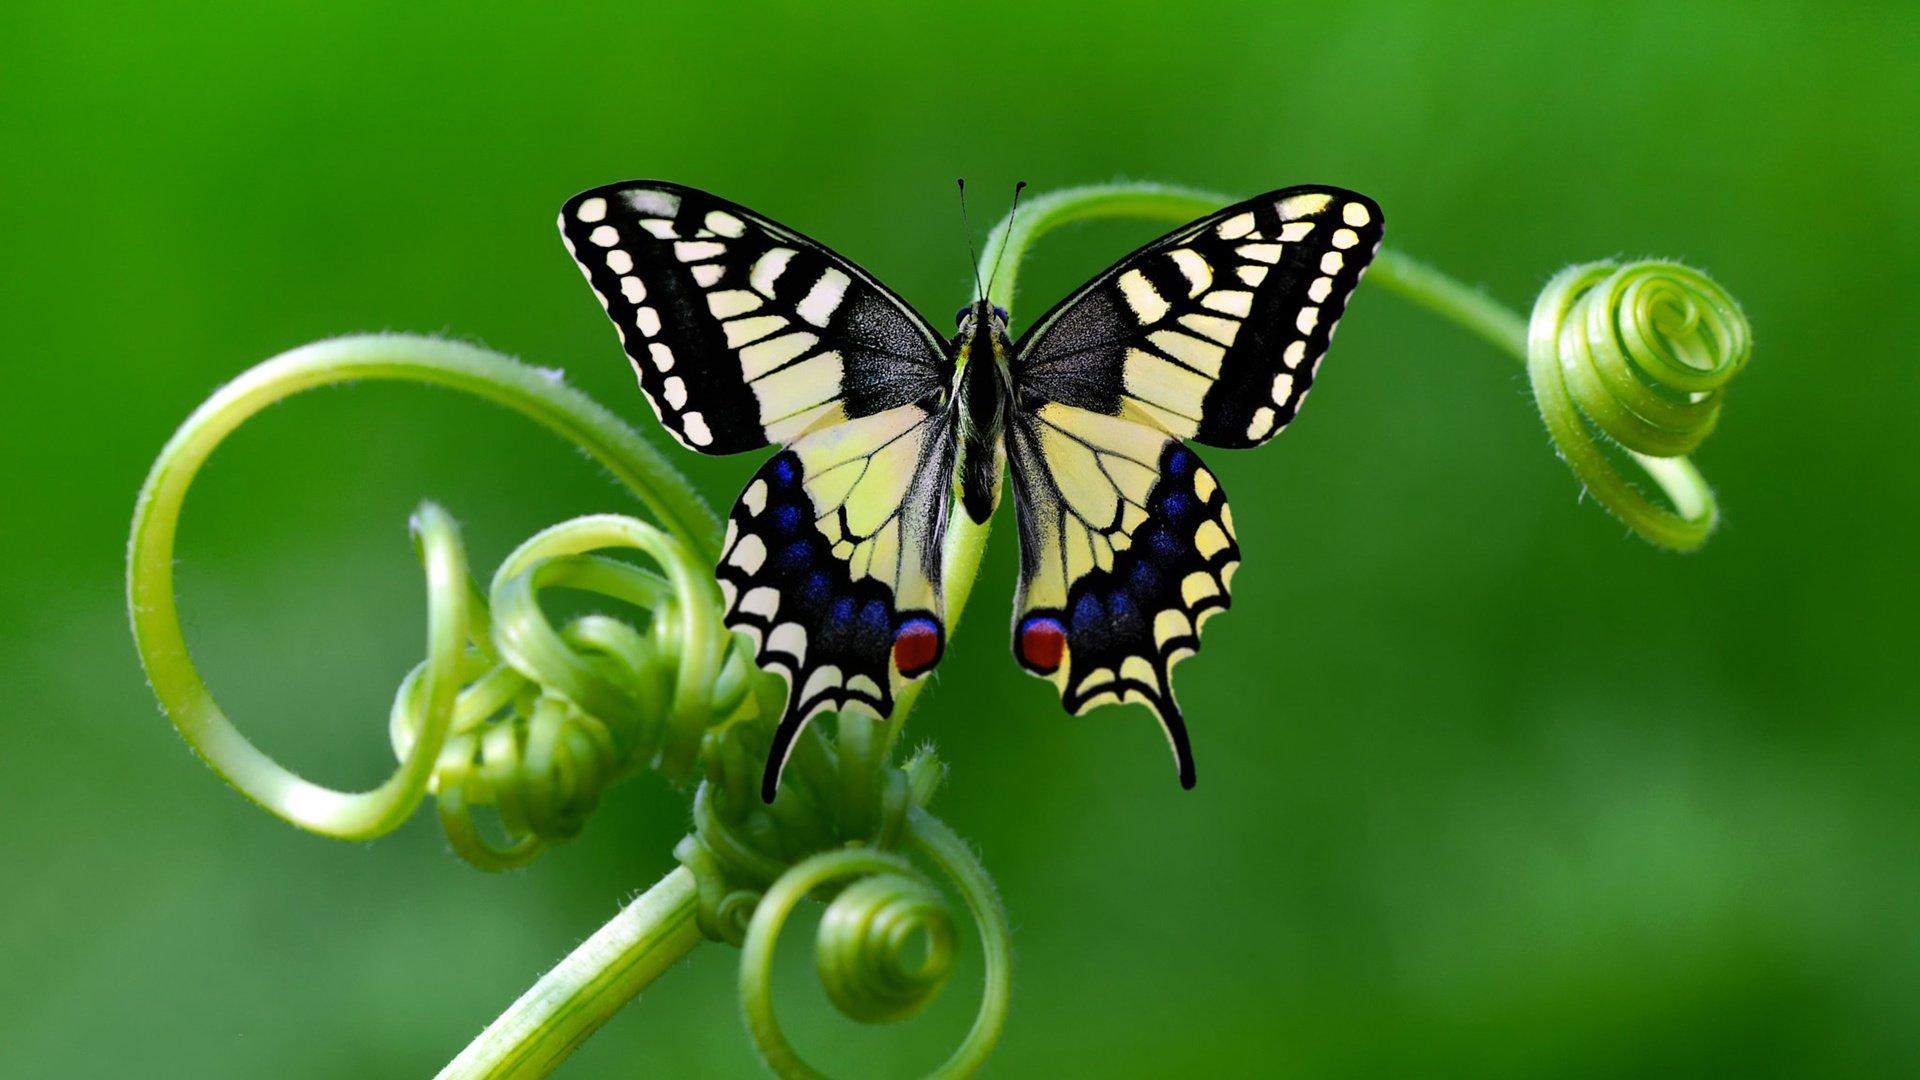 Бабочка на цветке макро без регистрации